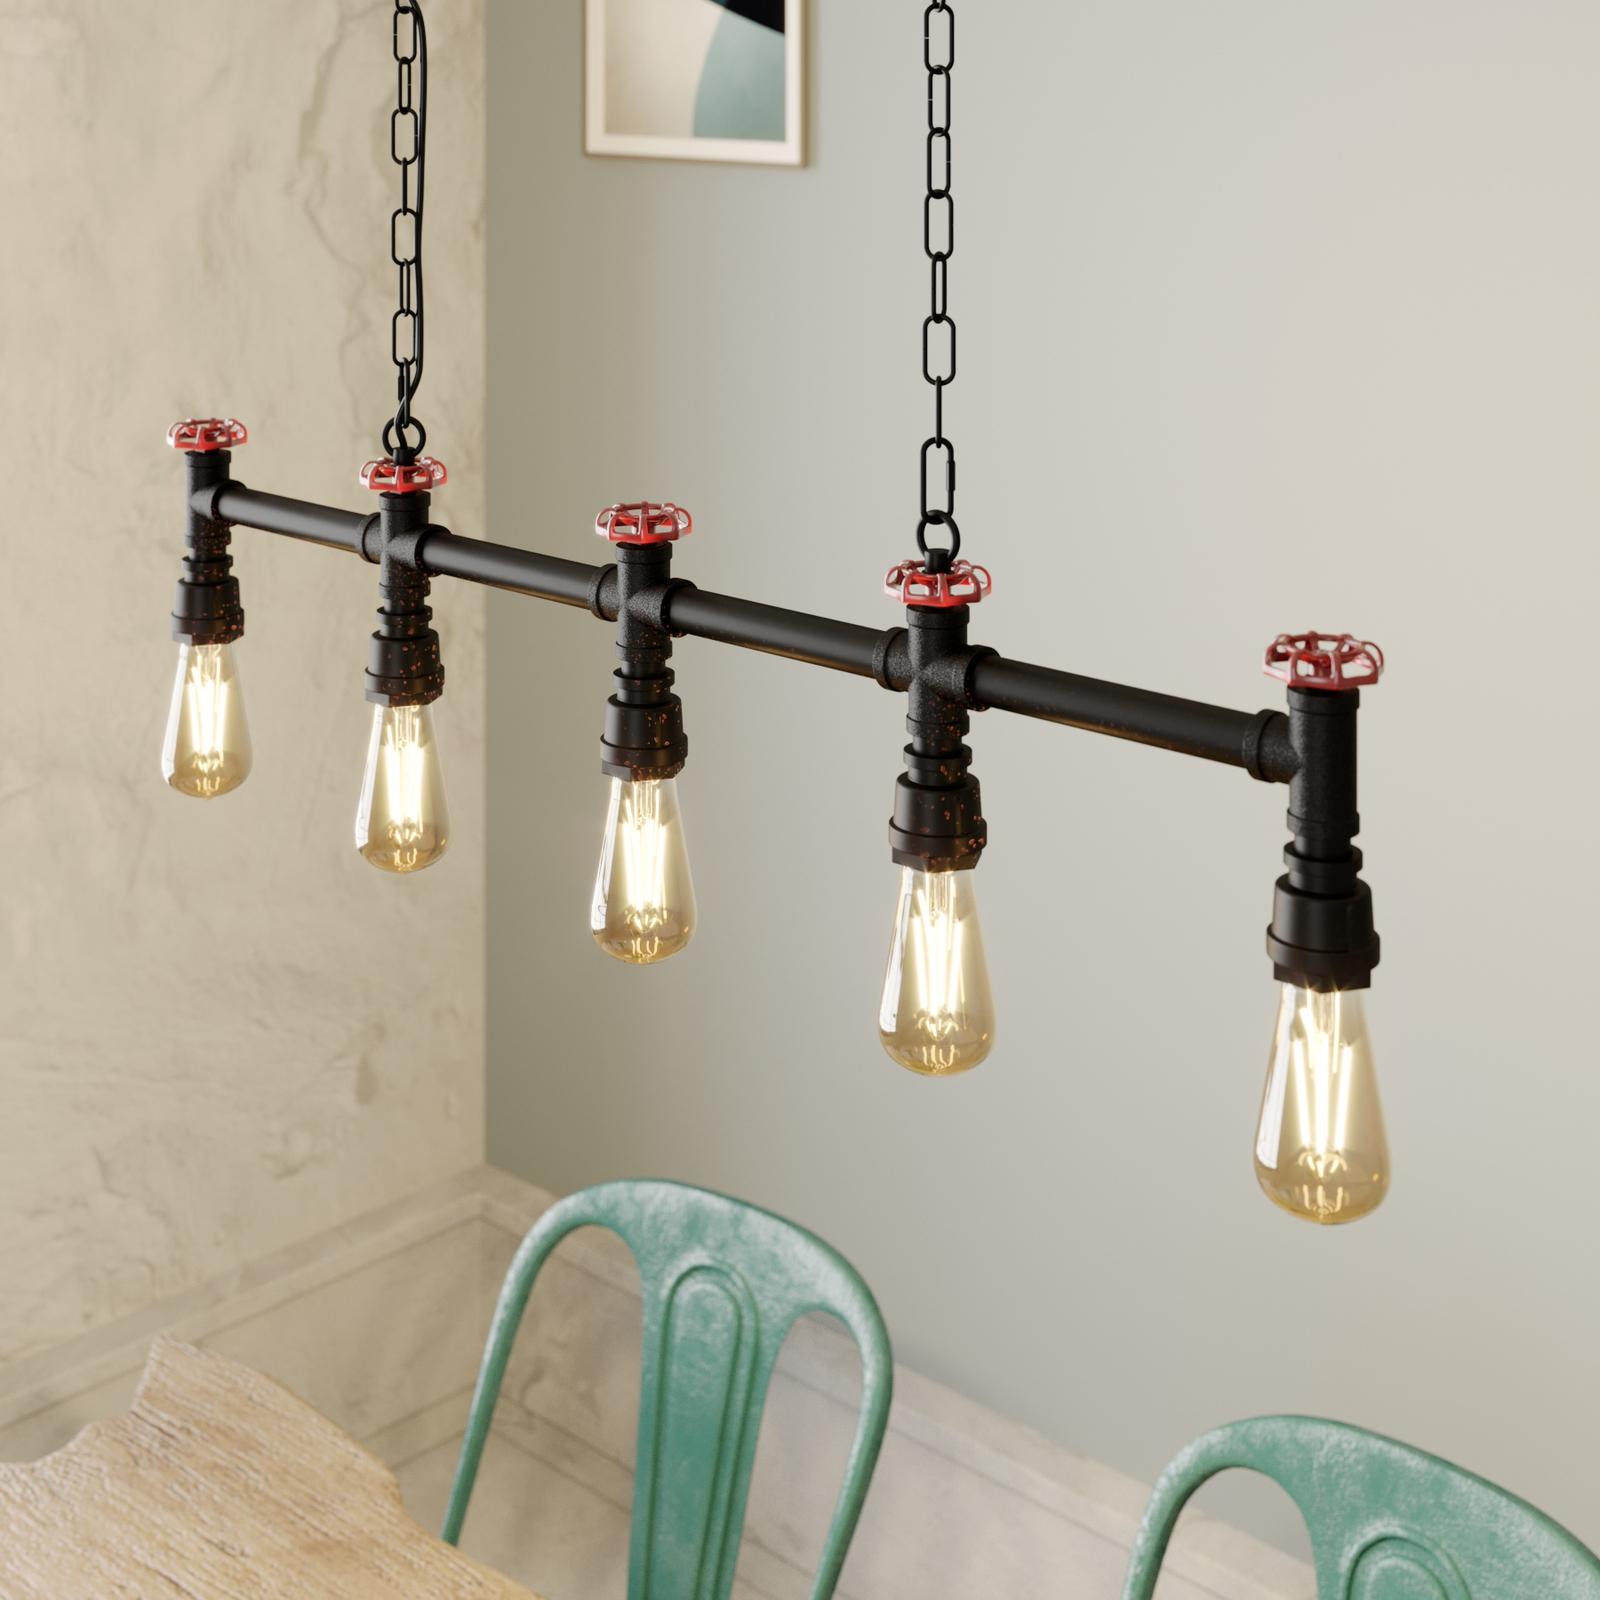 Lindby Zlata hanglamp, 5-lamps, industriële stijl